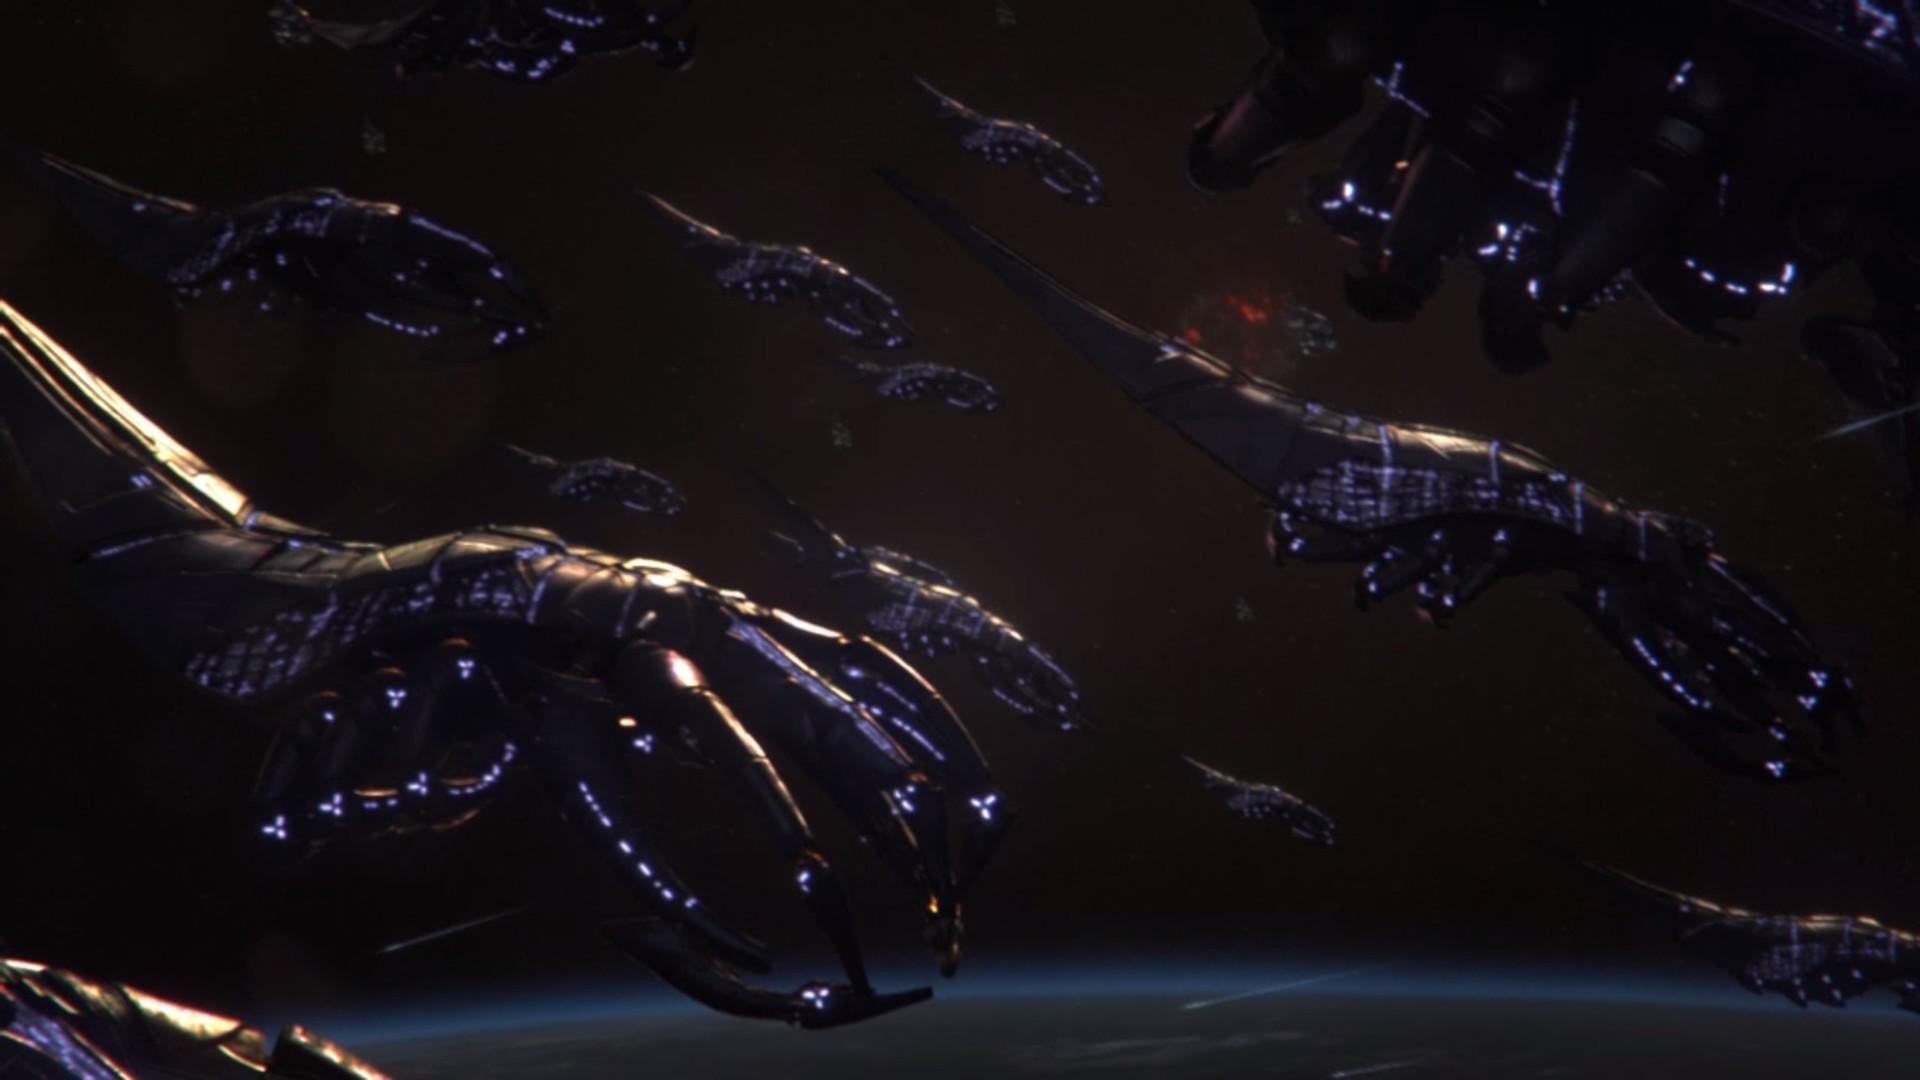 Cgi earth mass effect 3 fantasy art reapers wallpaper